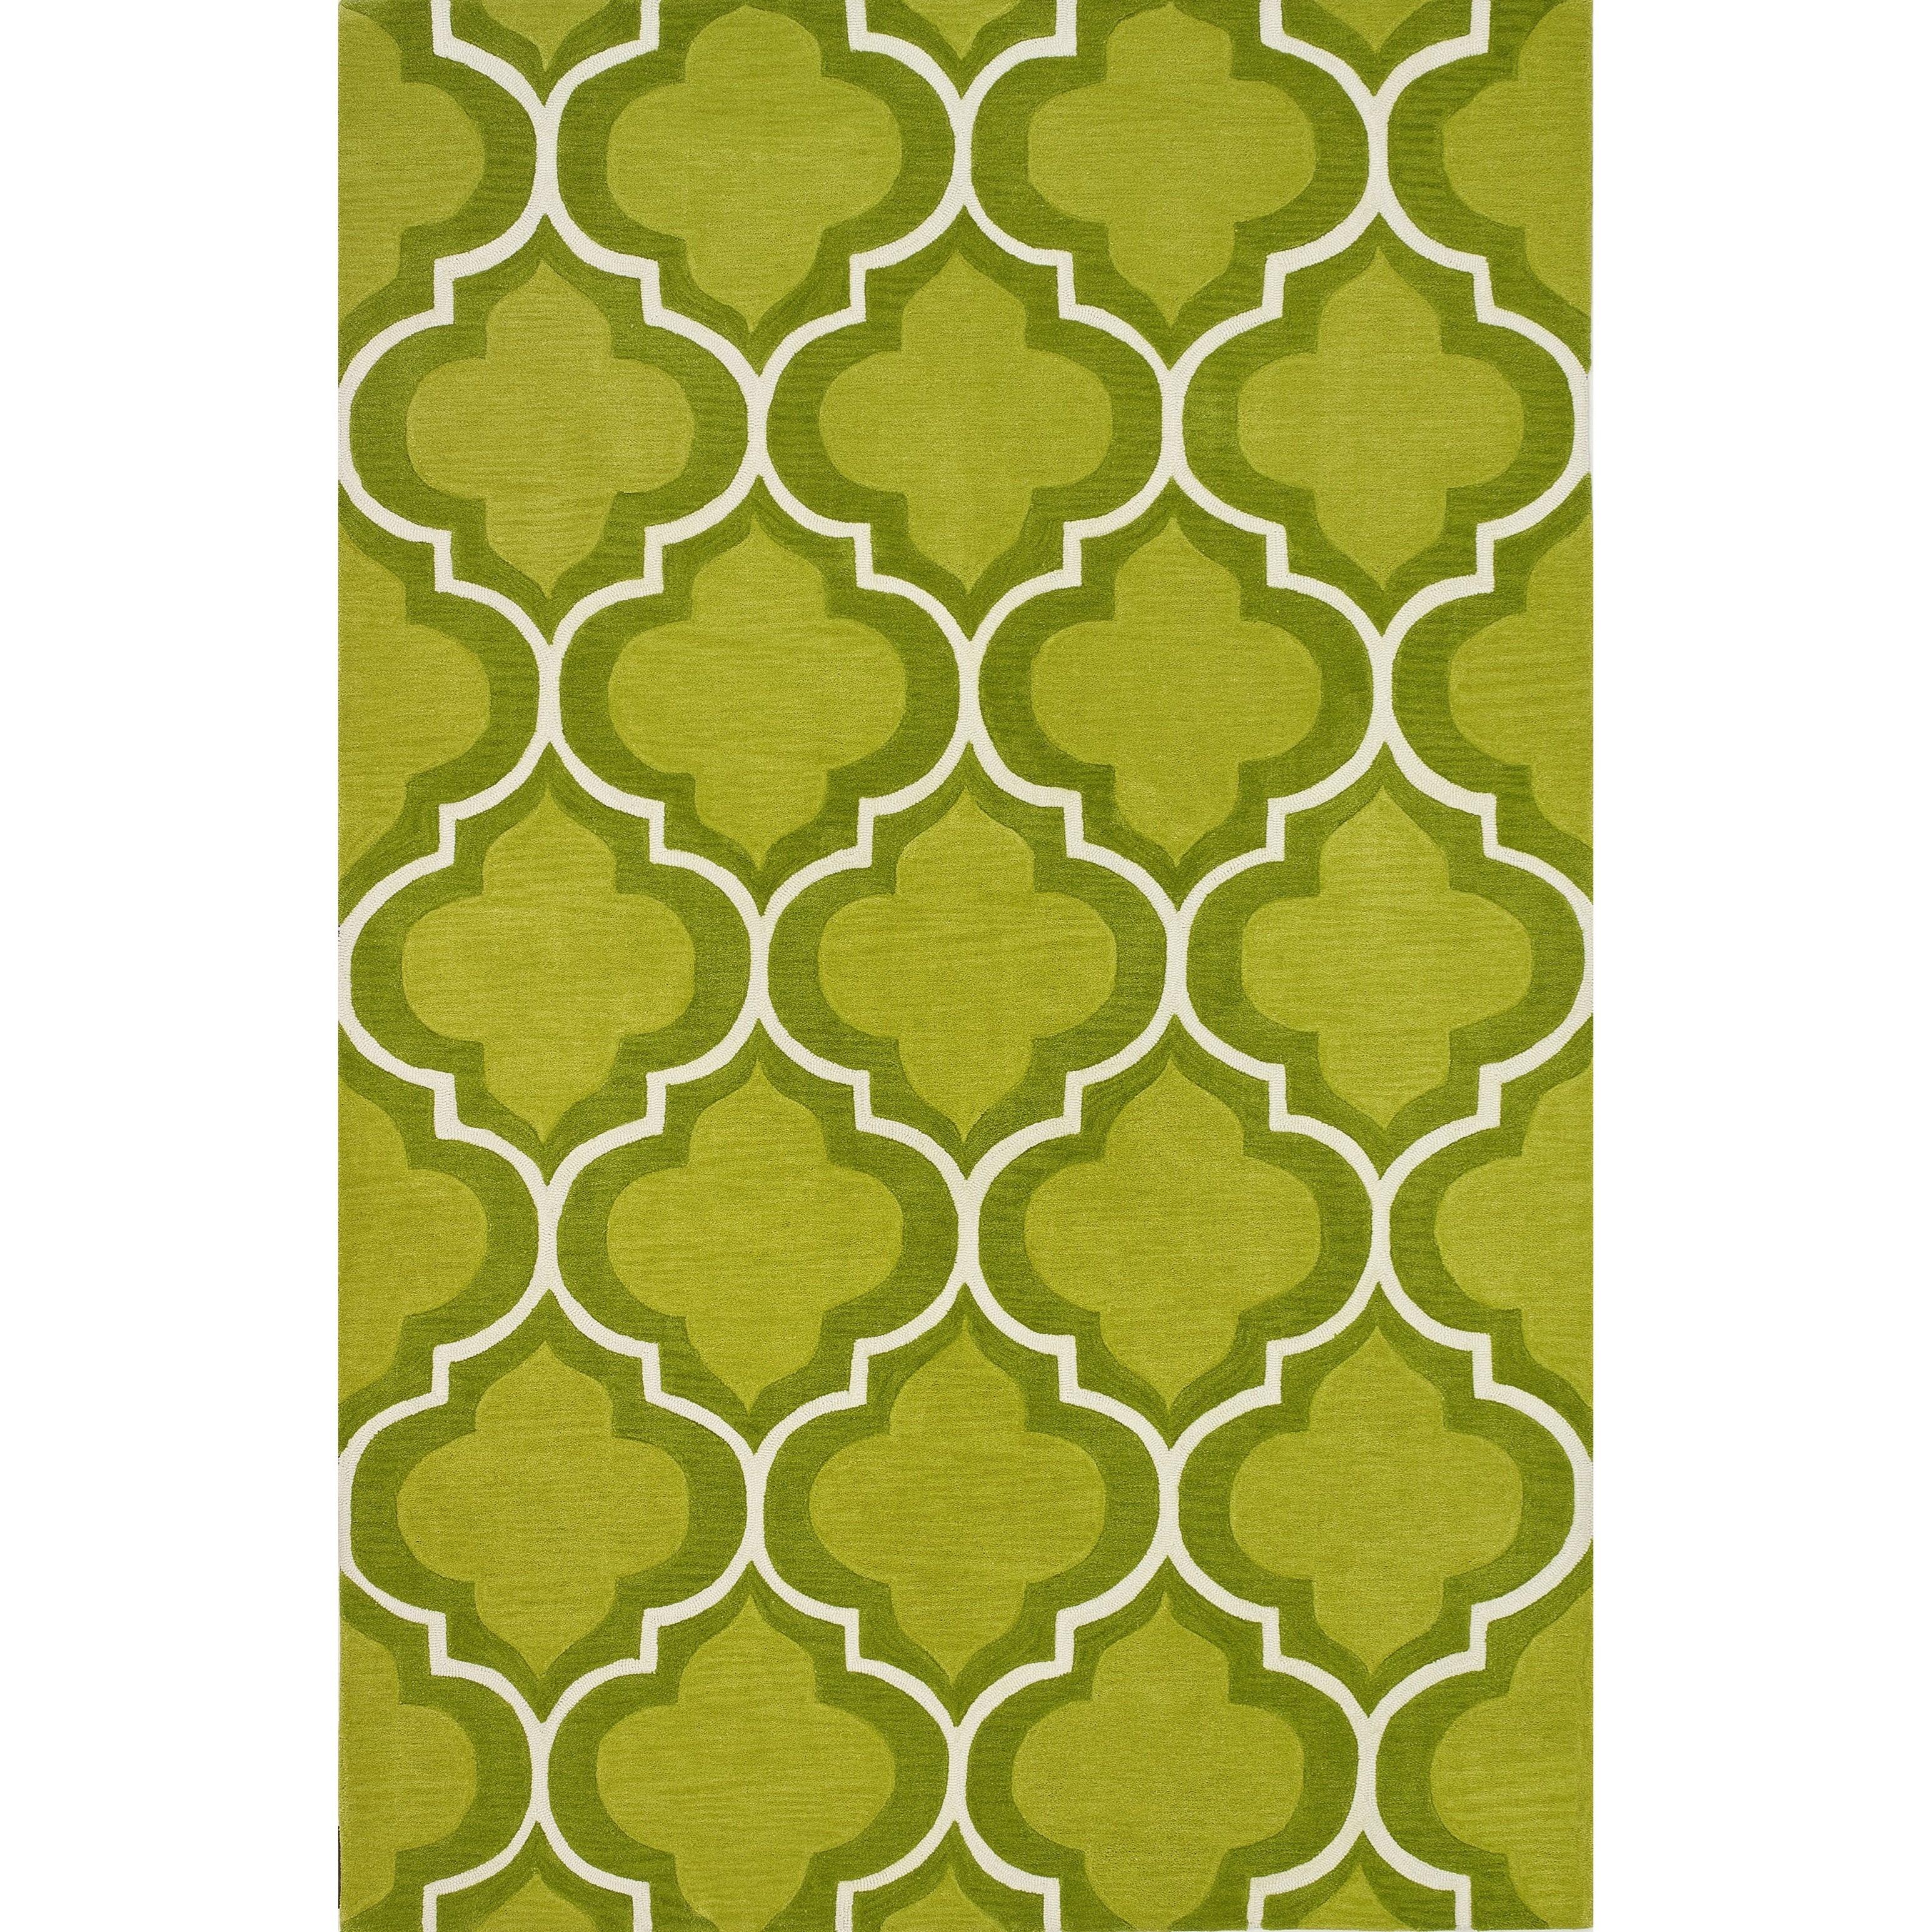 Dalyn Infinity Lime 9'X13' Rug - Item Number: IF3LI9X13